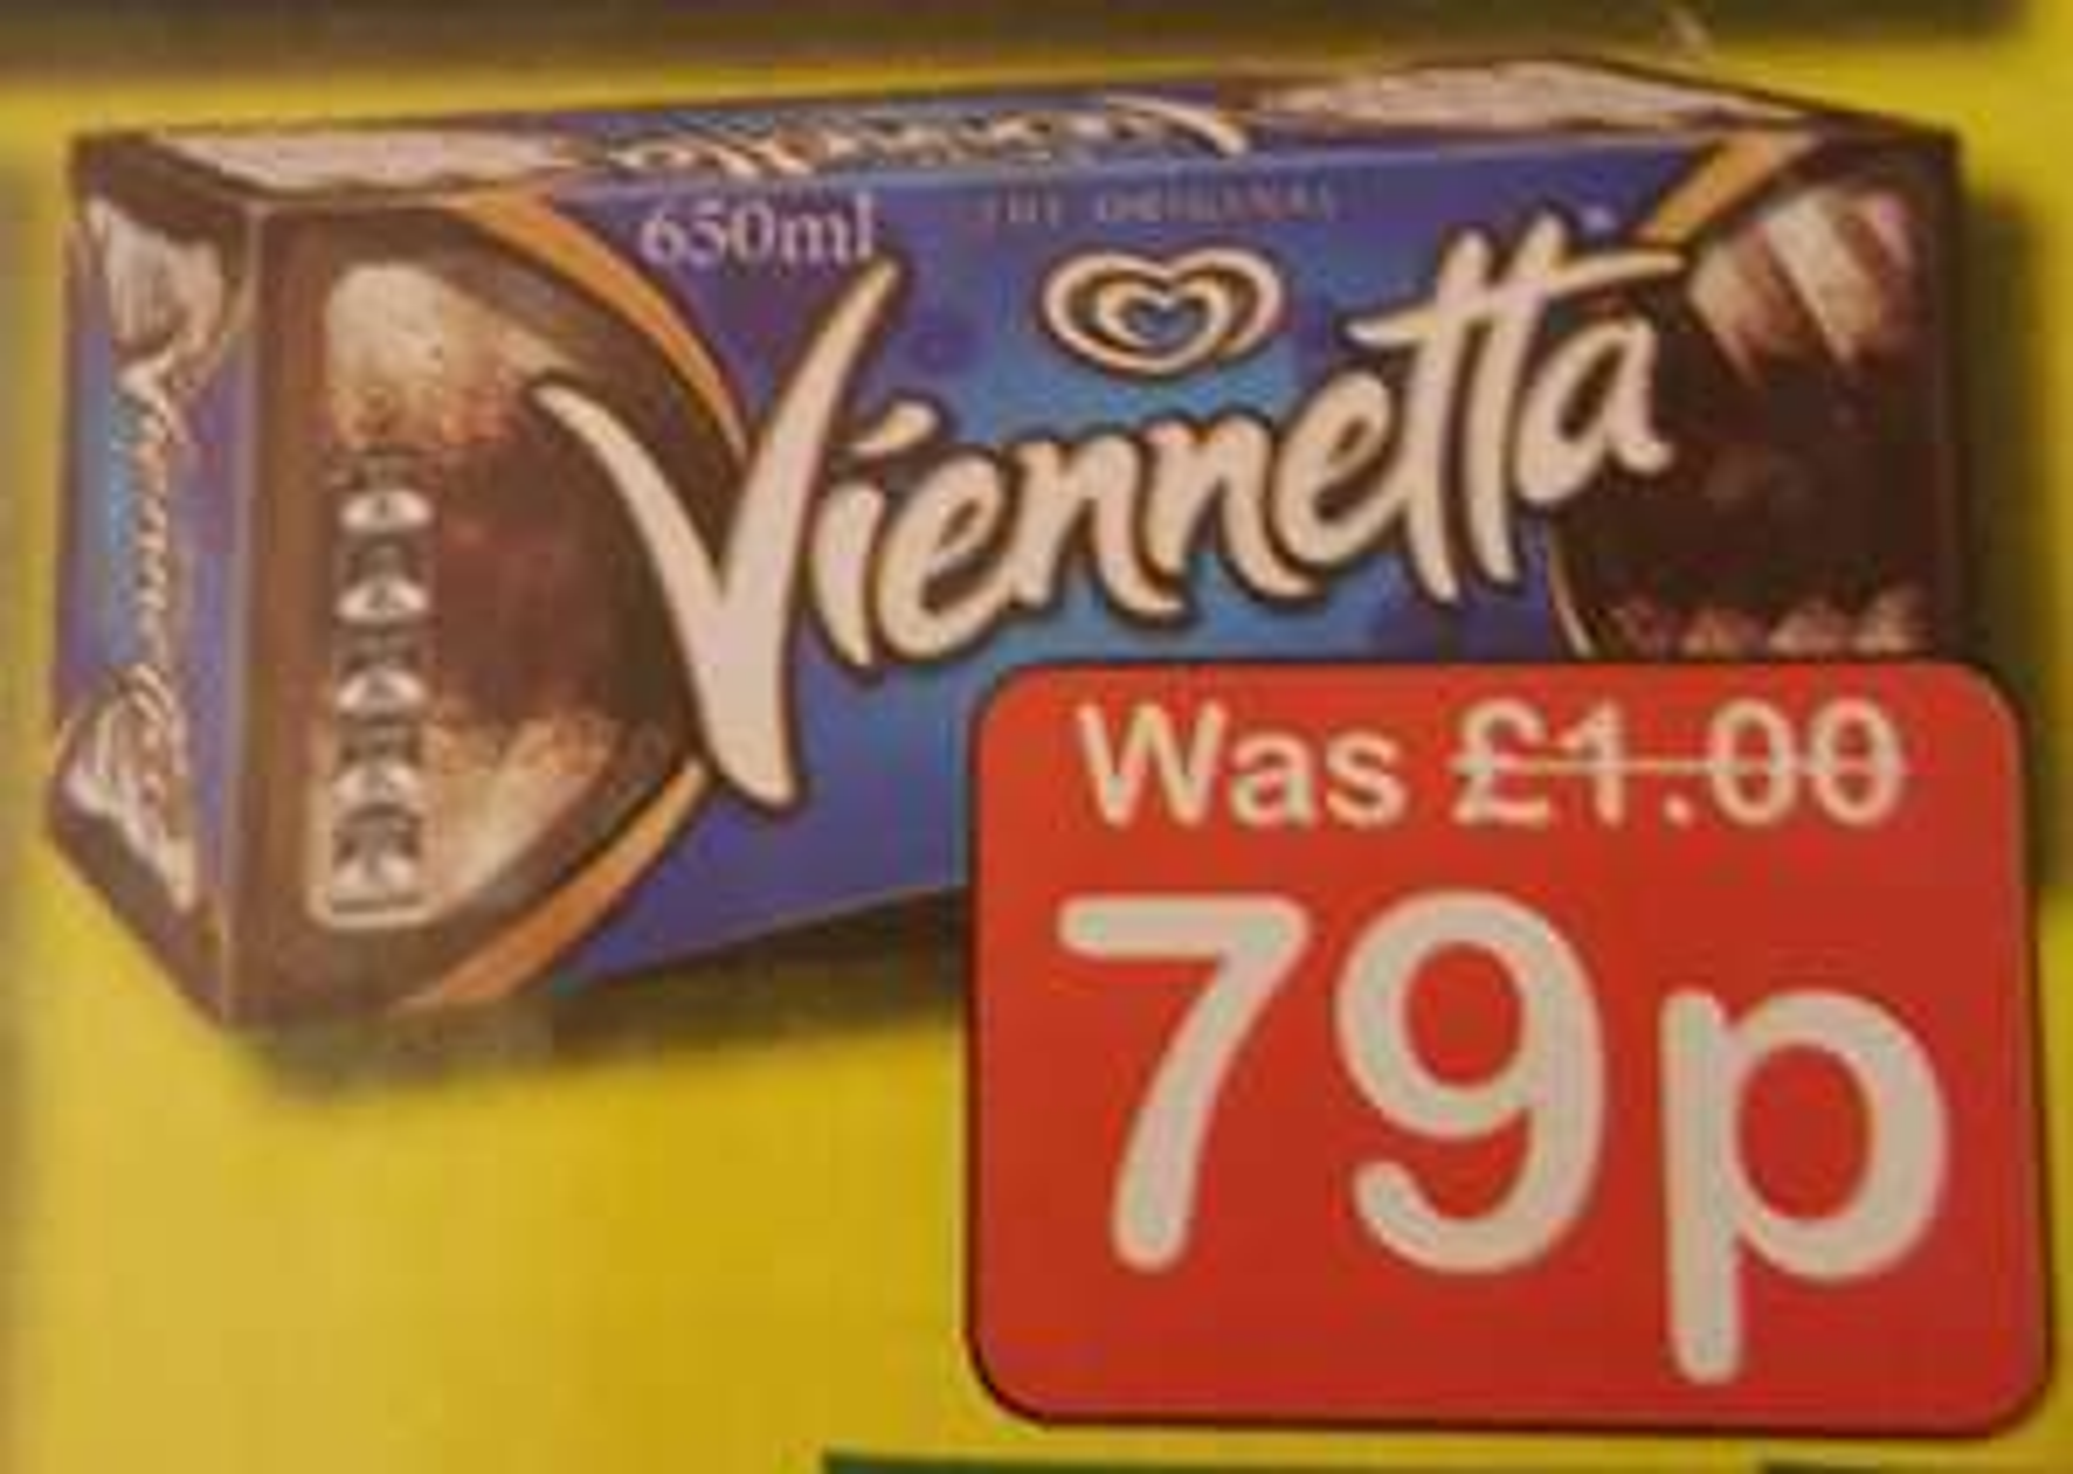 Viennetta (650ml) 79p at Farmfoods